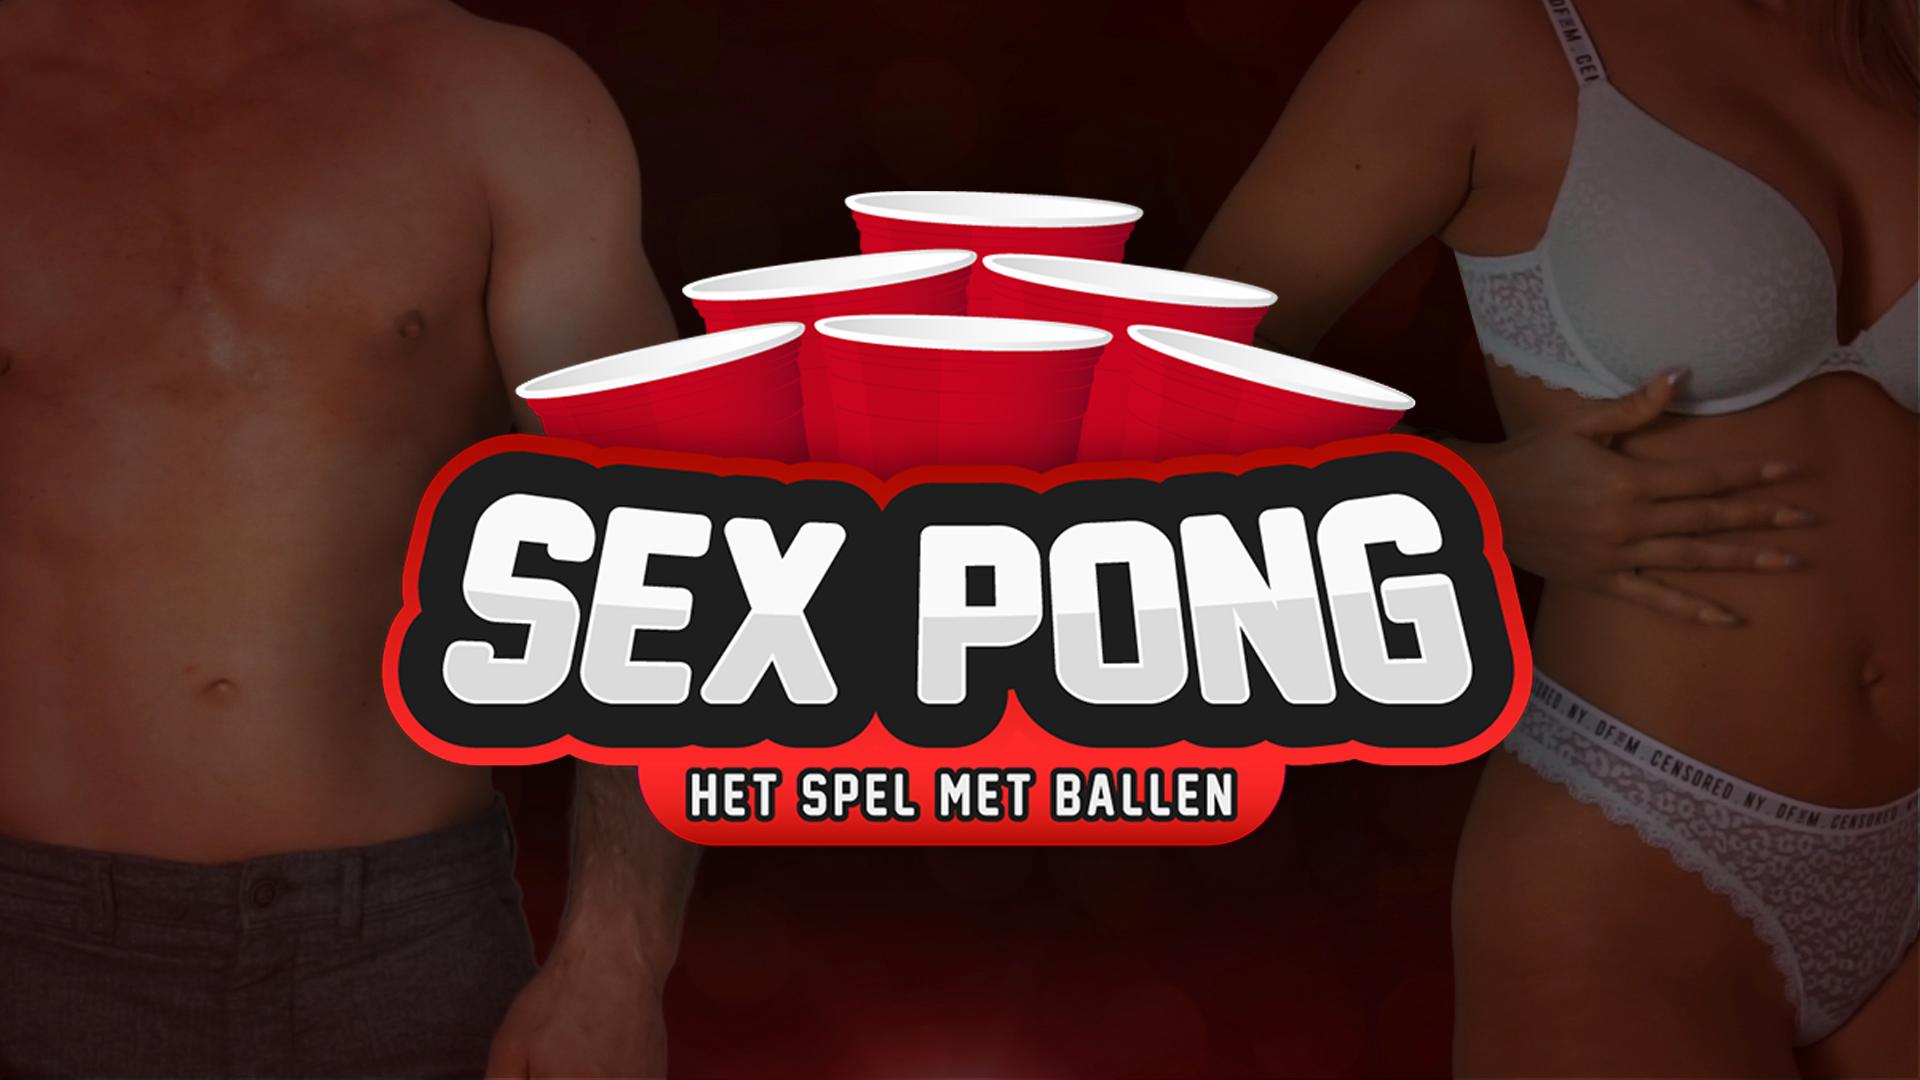 Geile foto van de hete Secret Circle seksfilm: Sex Pong